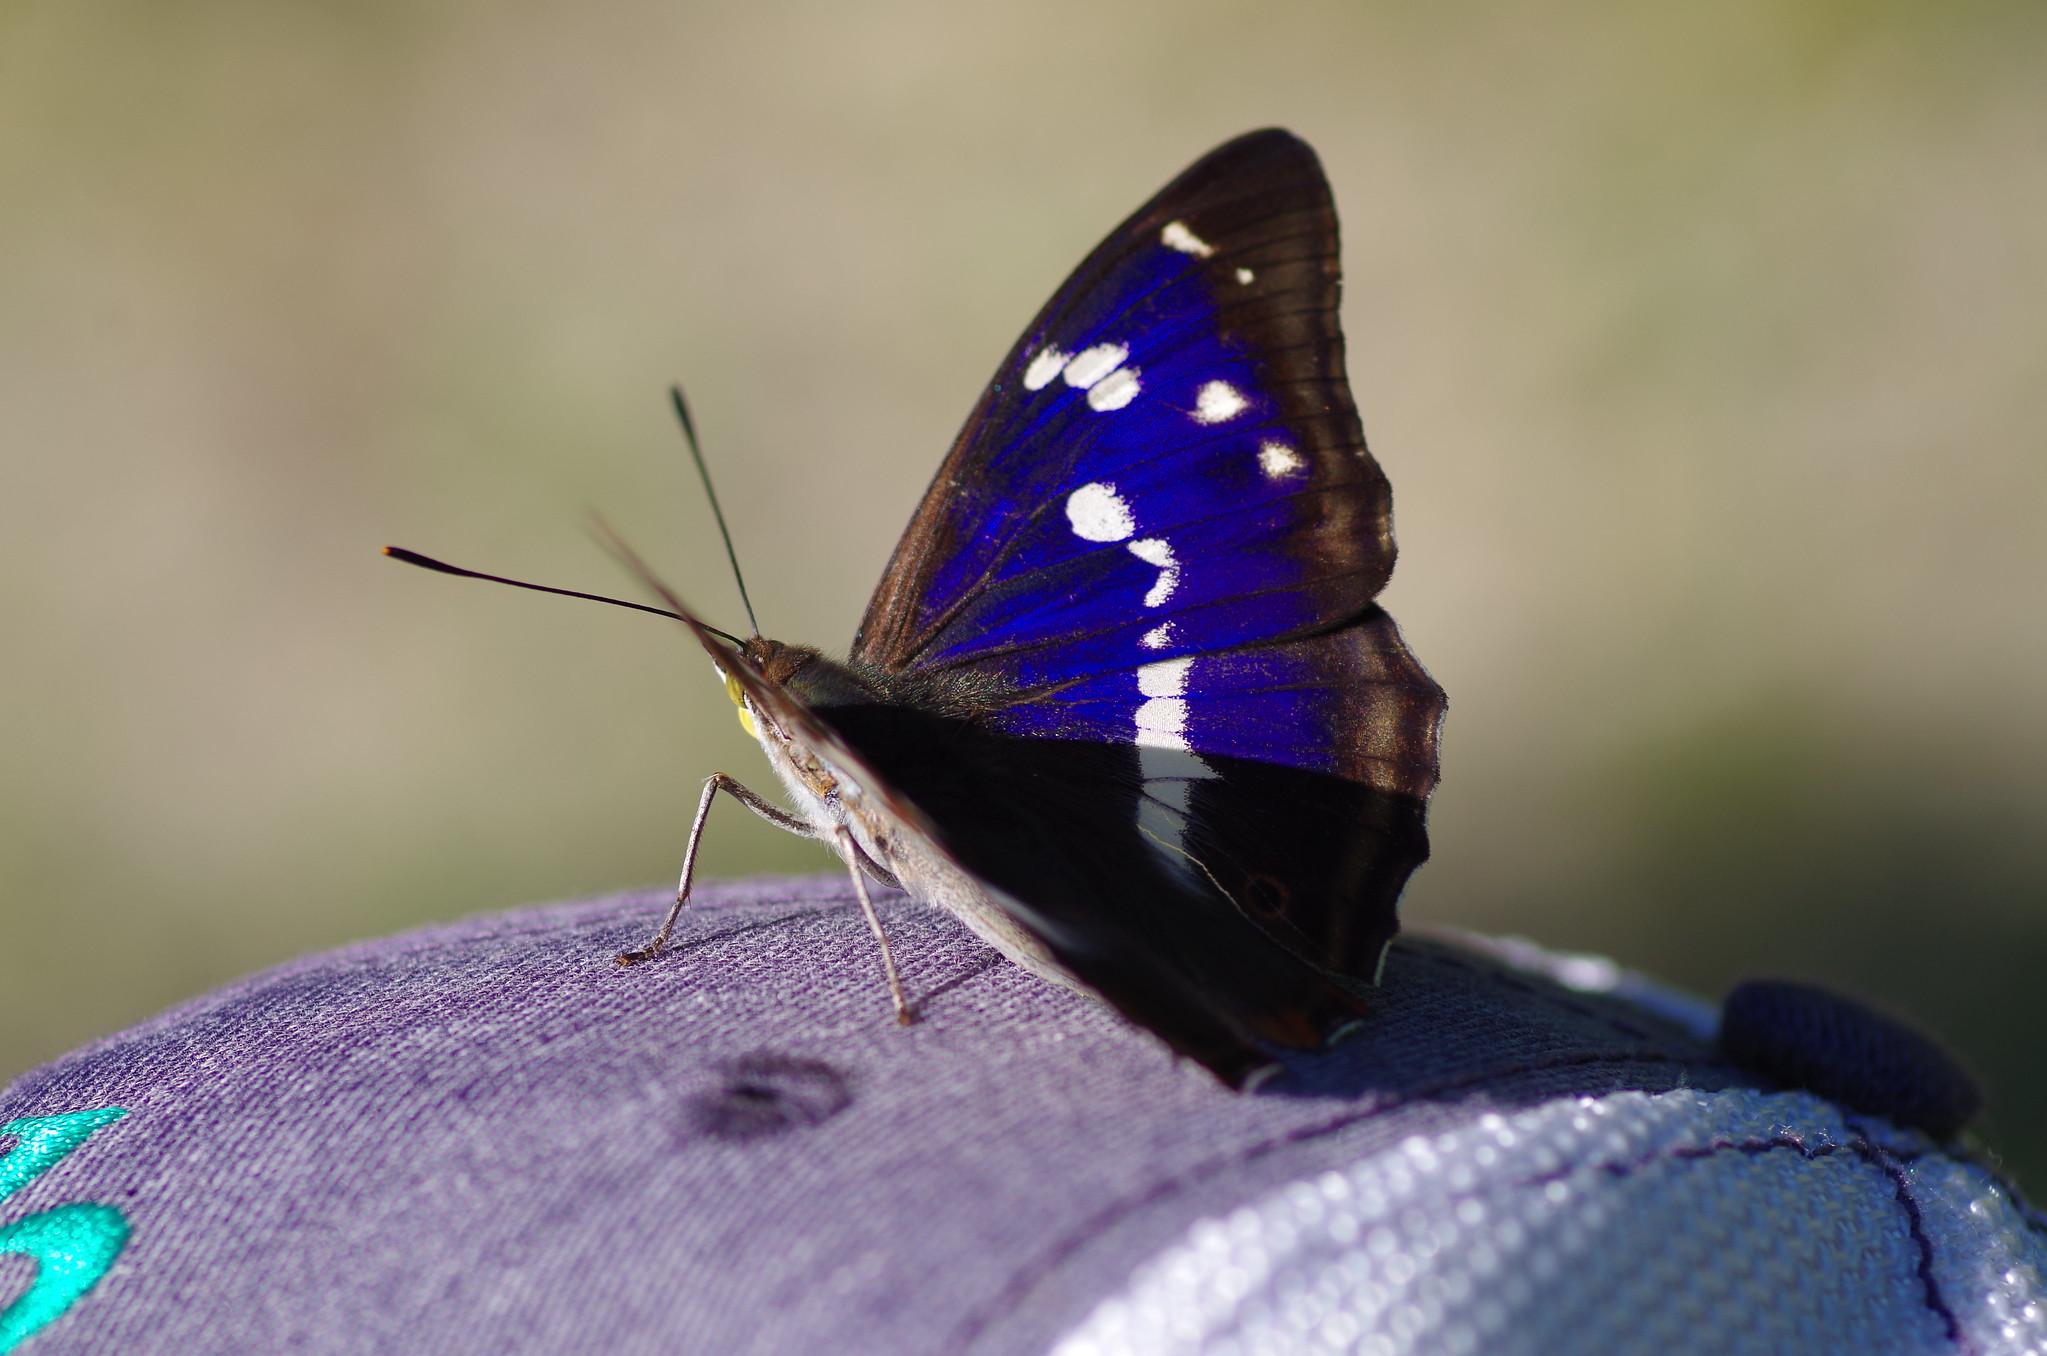 A purple butterfly, sunning itself